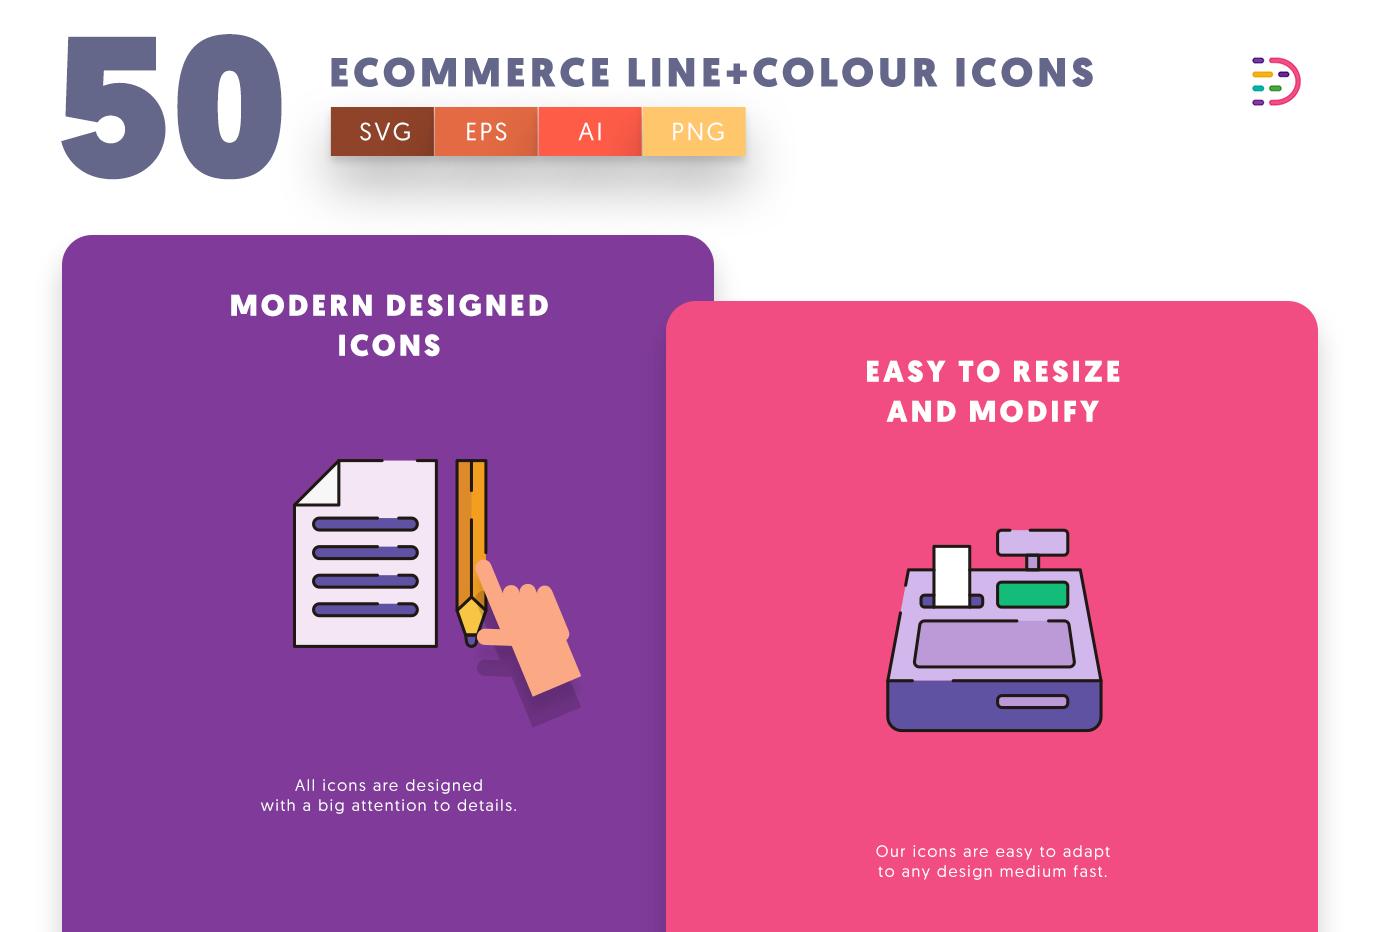 Ecommerce Line+Colour icons png/svg/eps